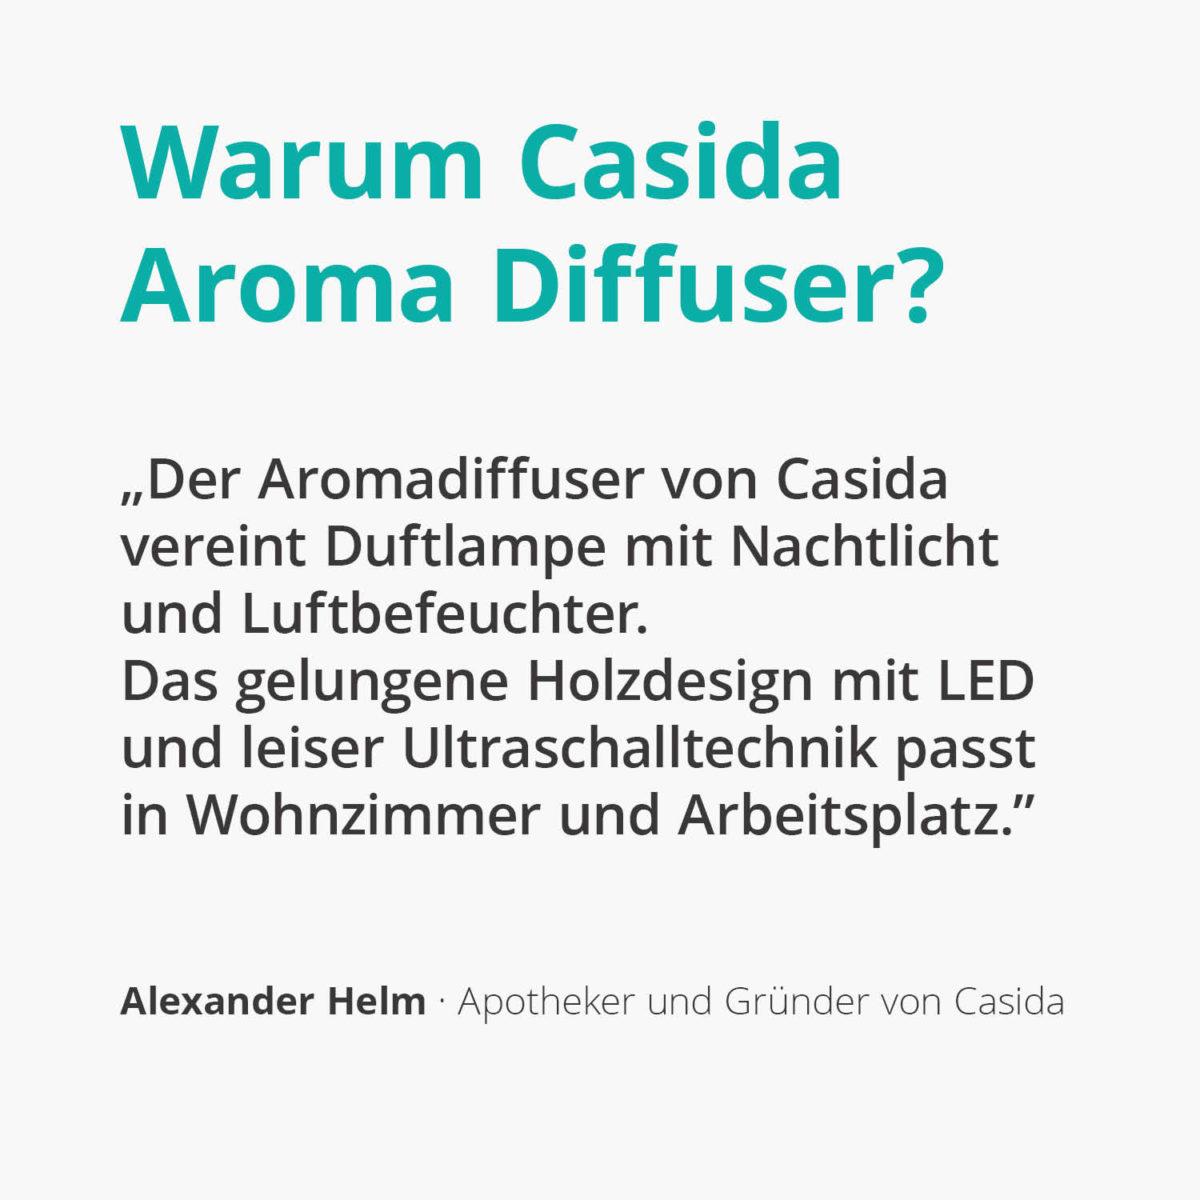 Casida Aroma Diffuser wood print design LED illumination 15880805 PZN Apotheke ätherische Öle Vernebler Aromatherapie